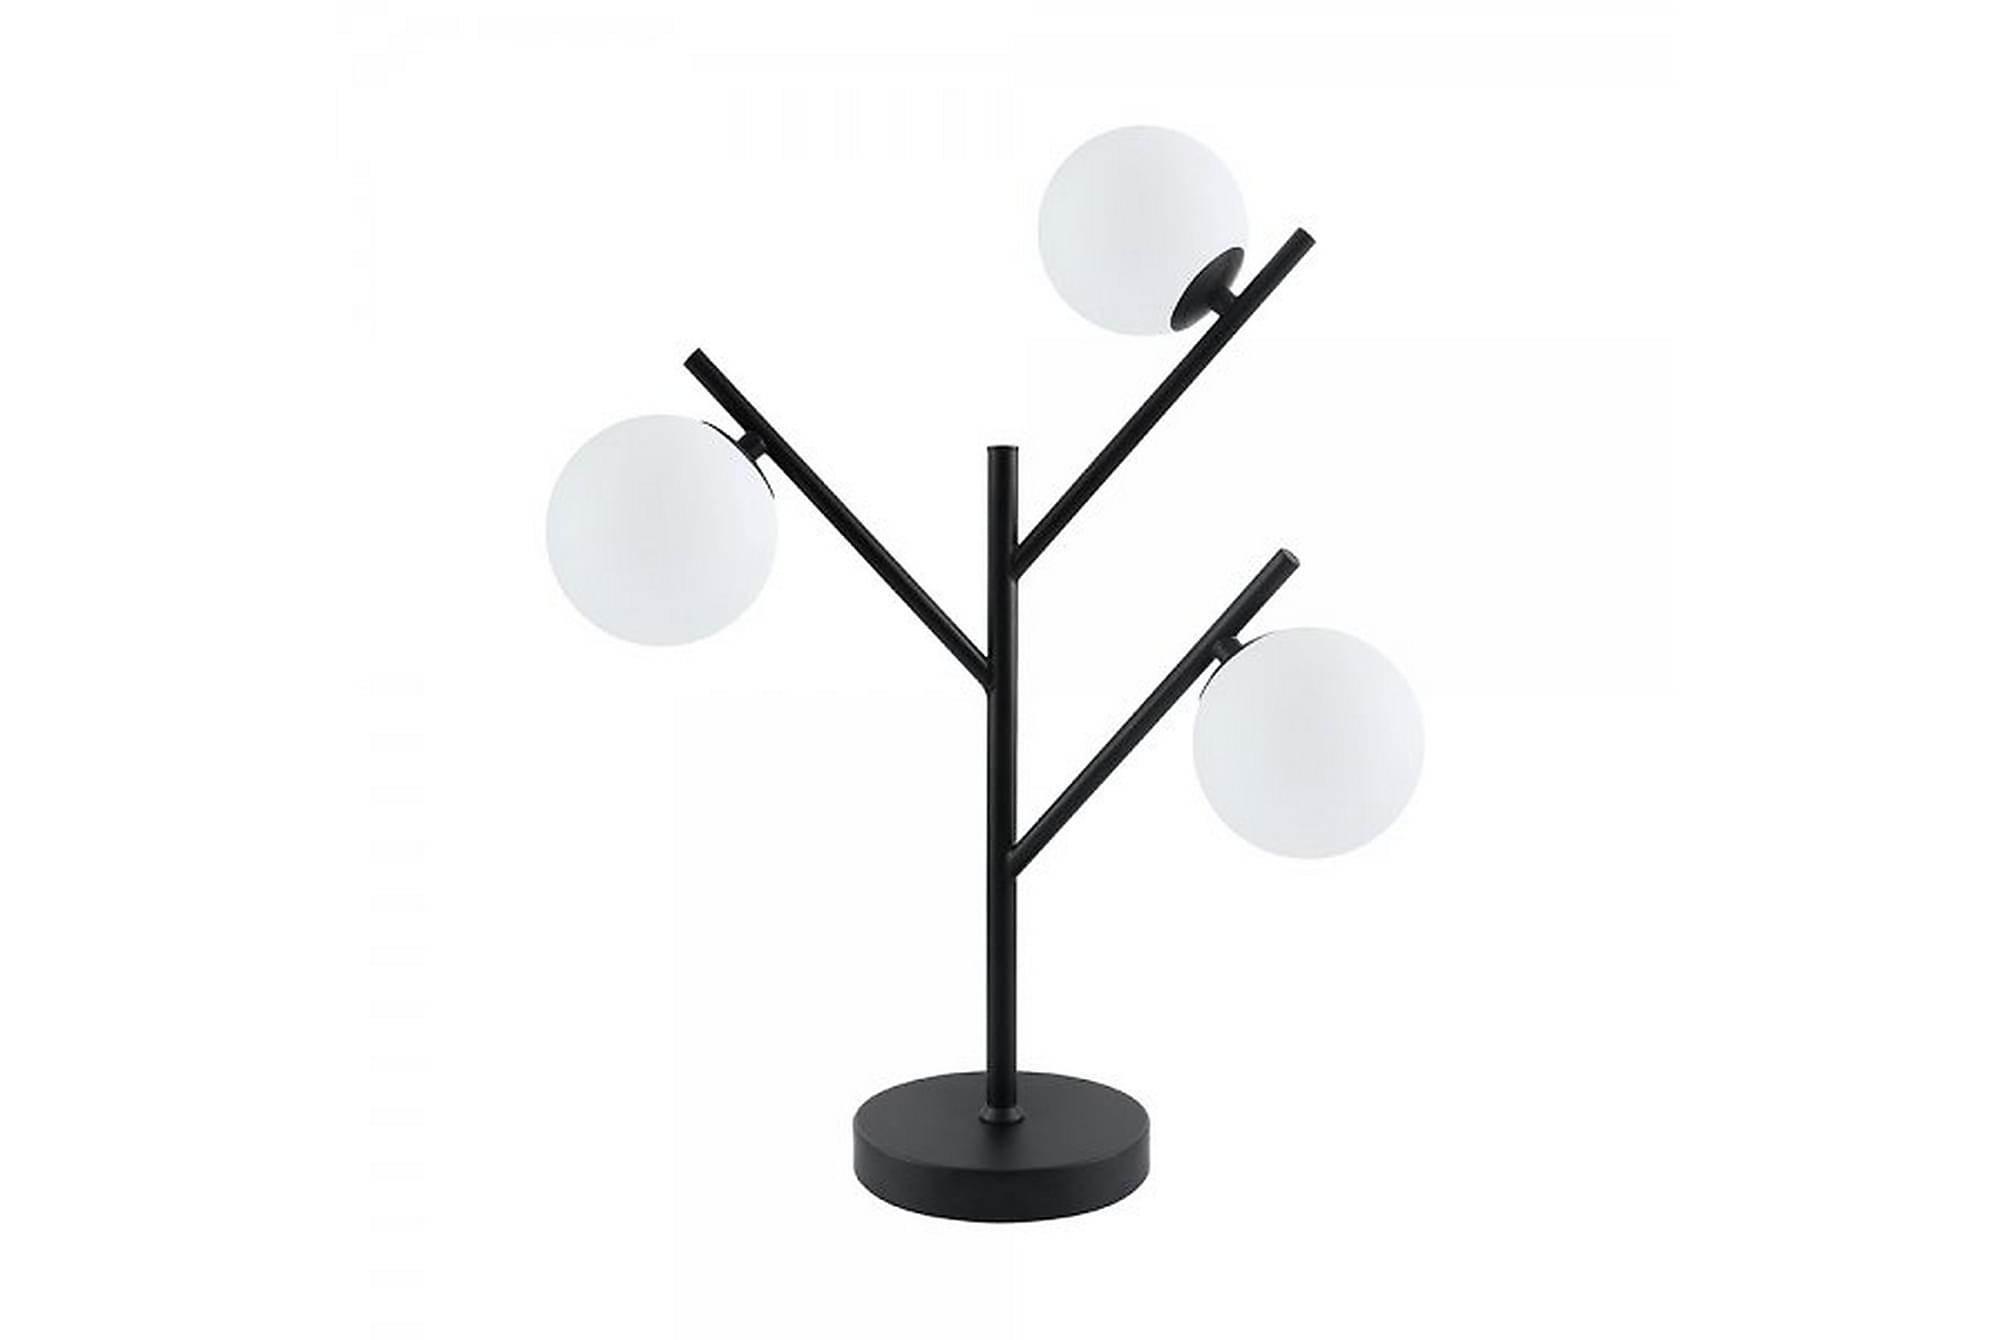 SMARHOLMEN Bordslampa Svart, Bordslampor thumbnail